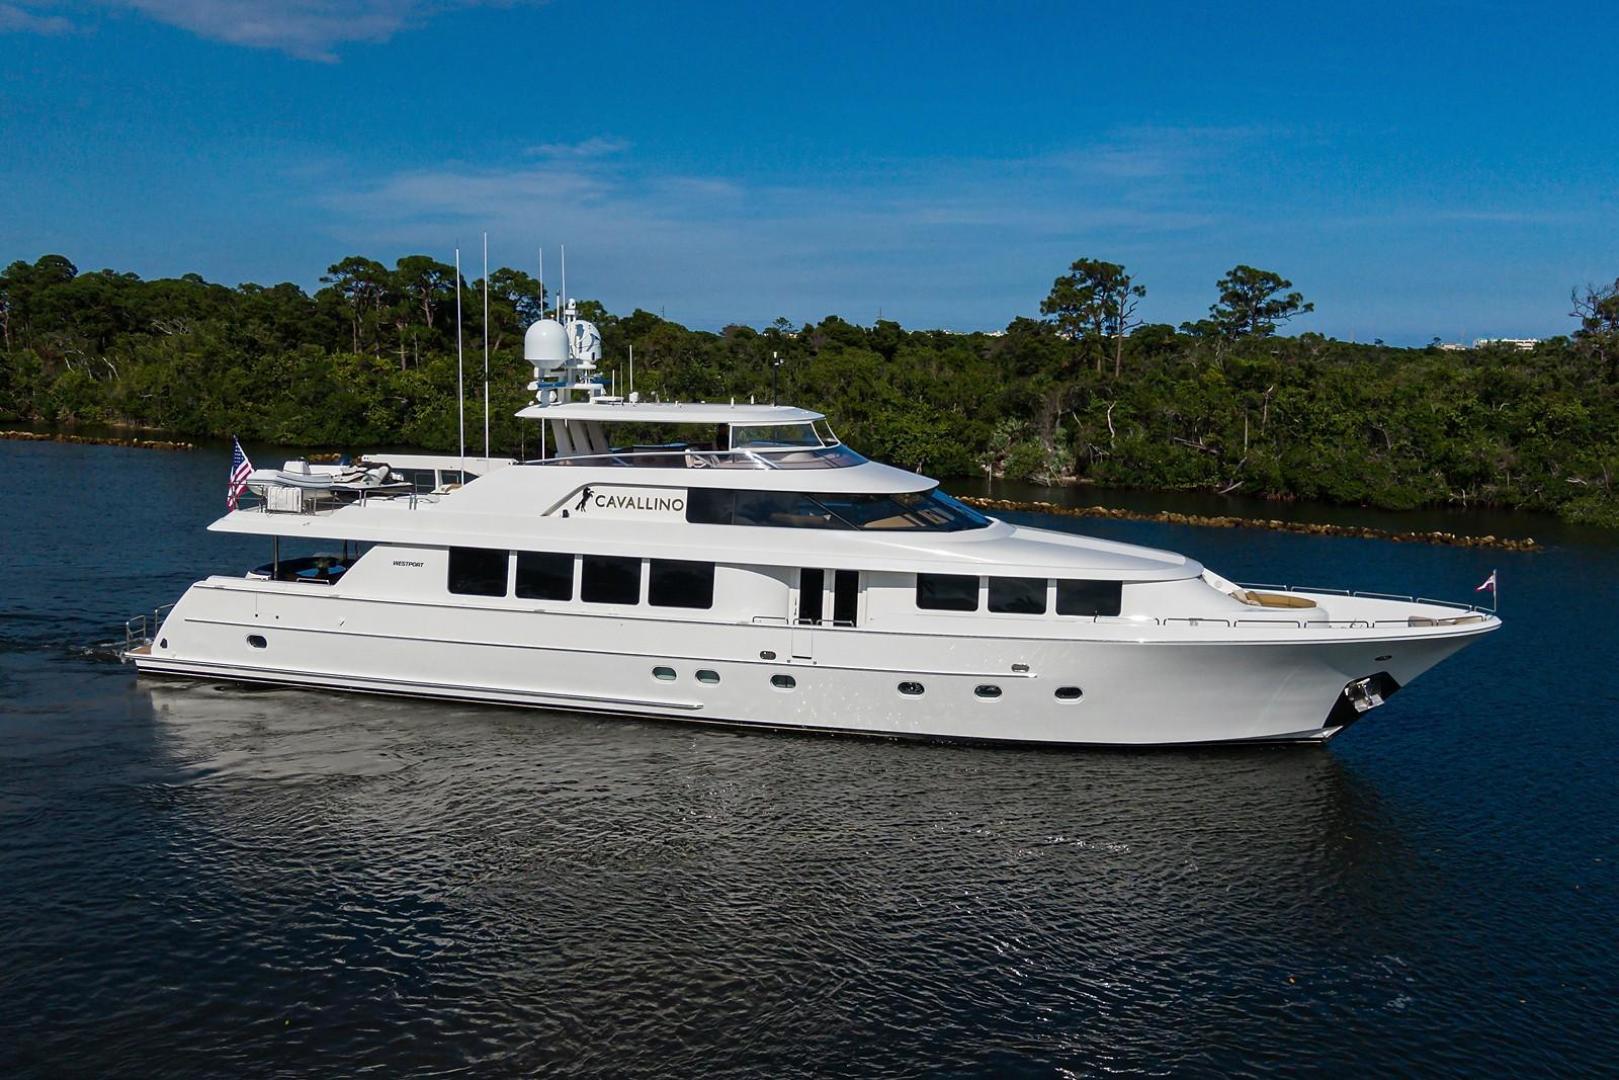 Westport-Motoryacht 2010-Cavallino Fort Lauderdale-Florida-United States-Starboard Profile-1270078 | Thumbnail